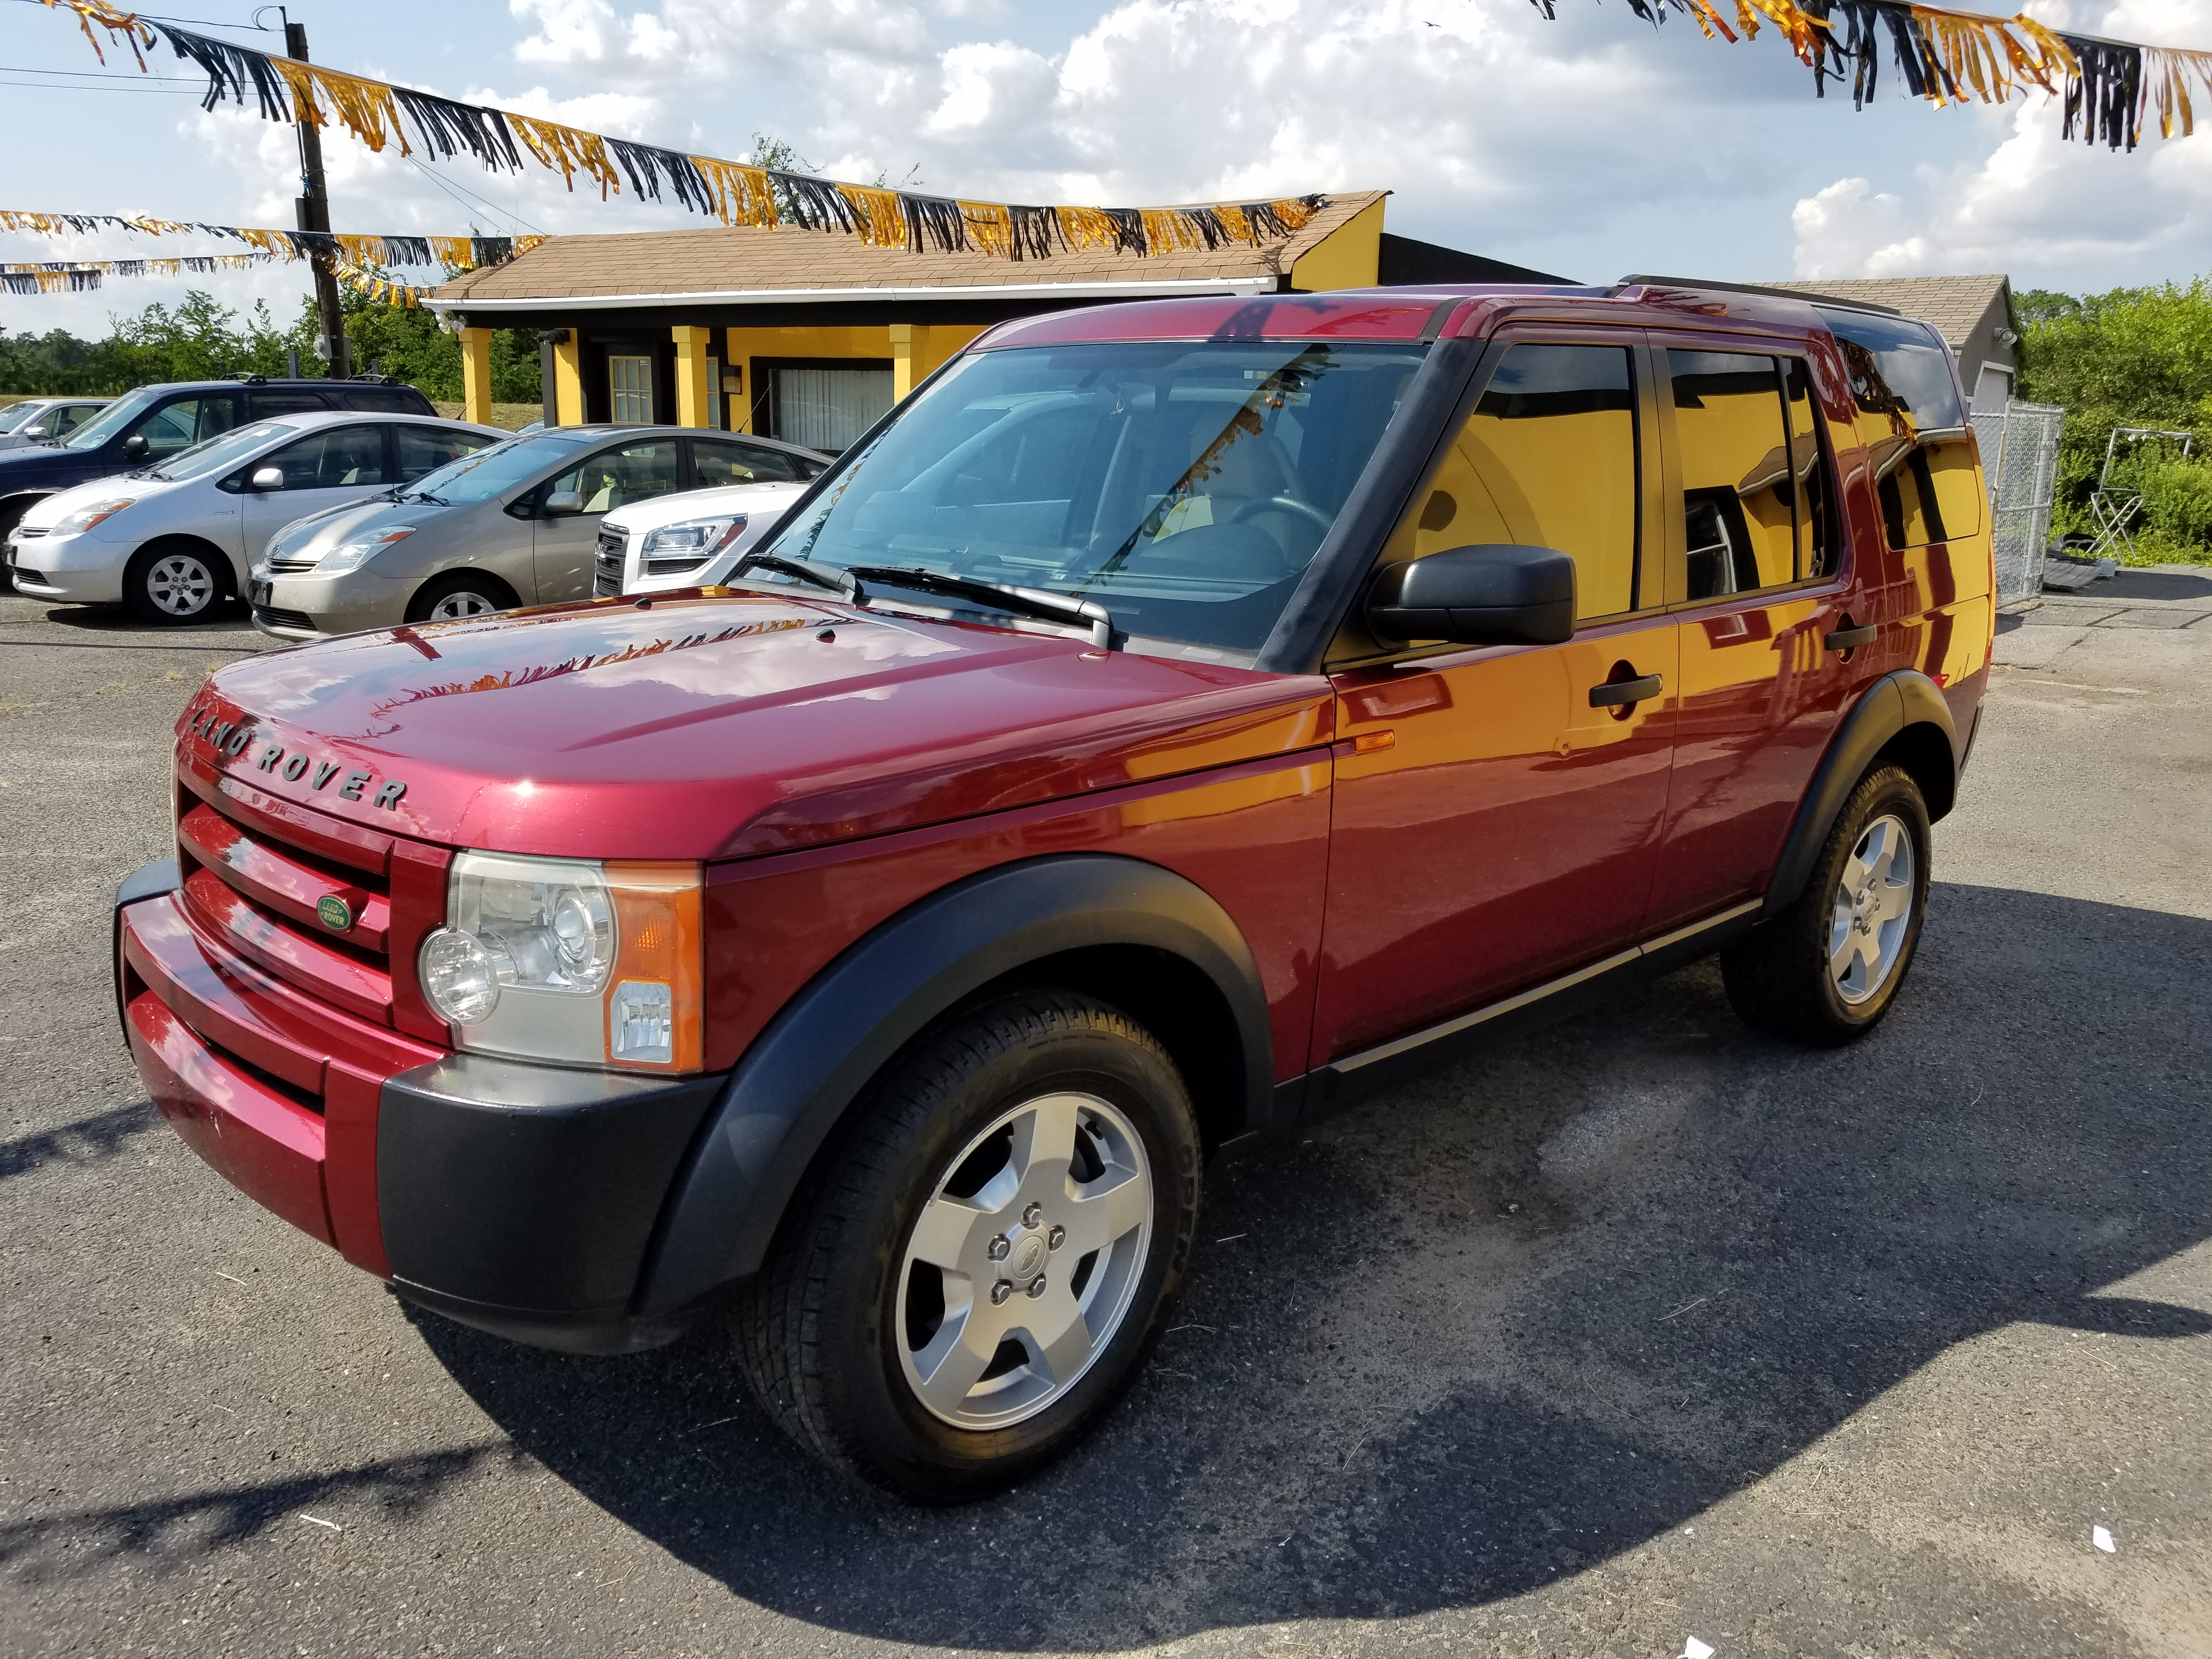 Used Cars Pickup Trucks Specials Hazlet Nj 07730